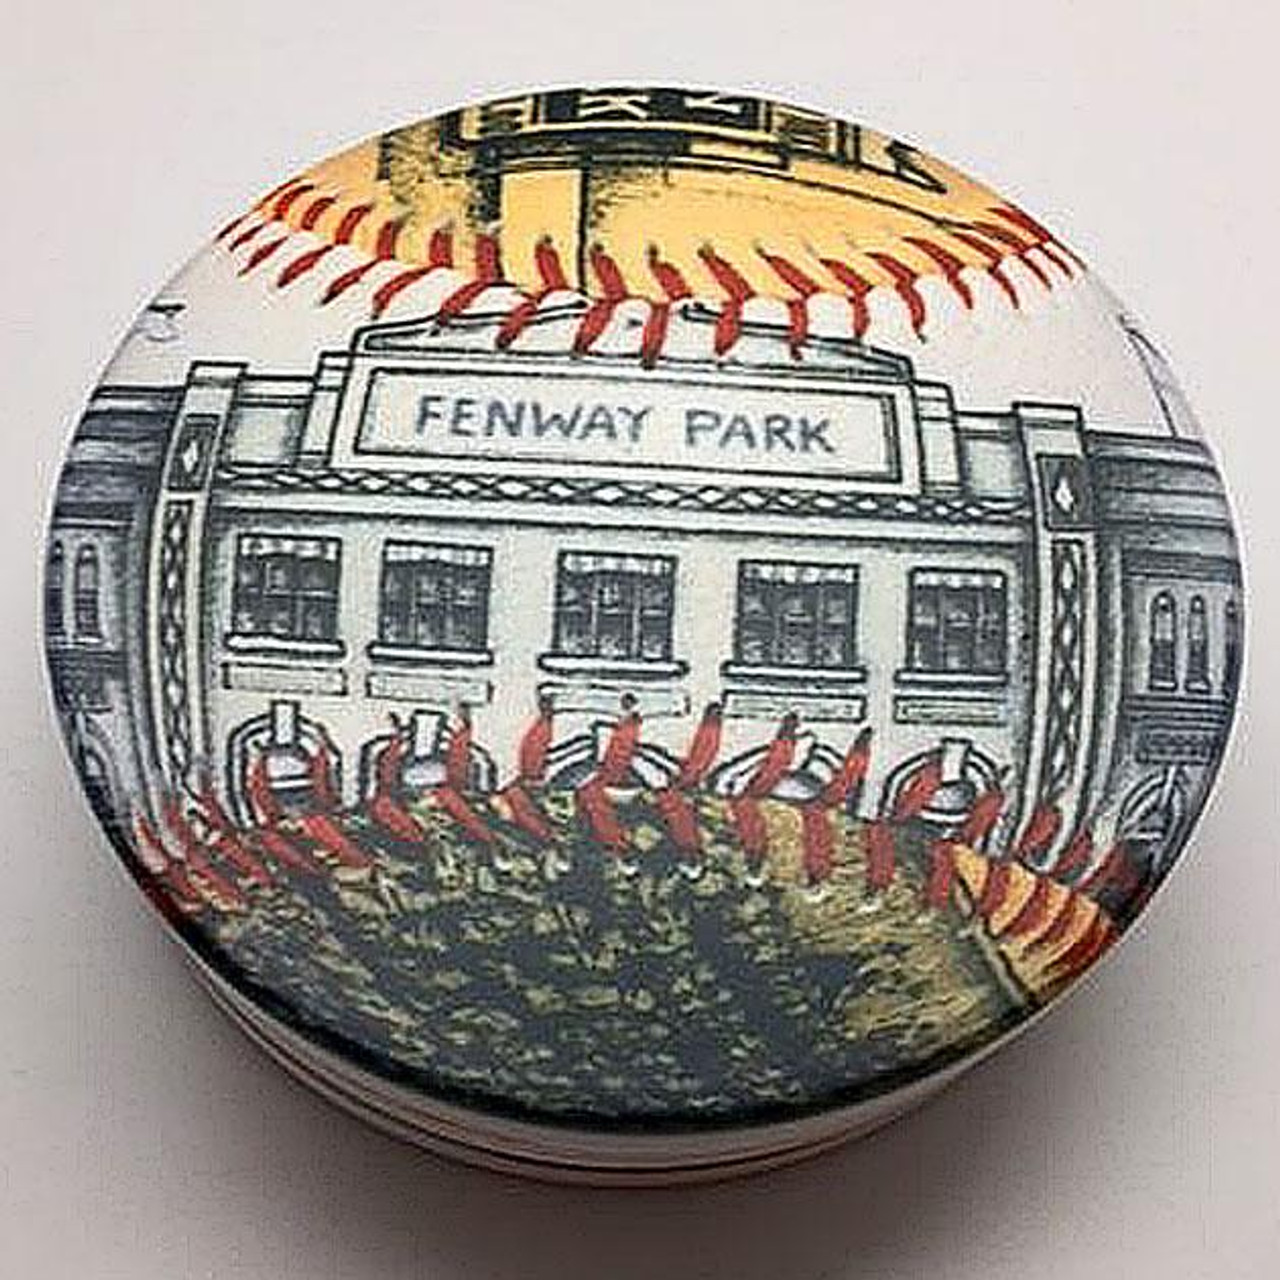 Fenway Park Park Coaster Set